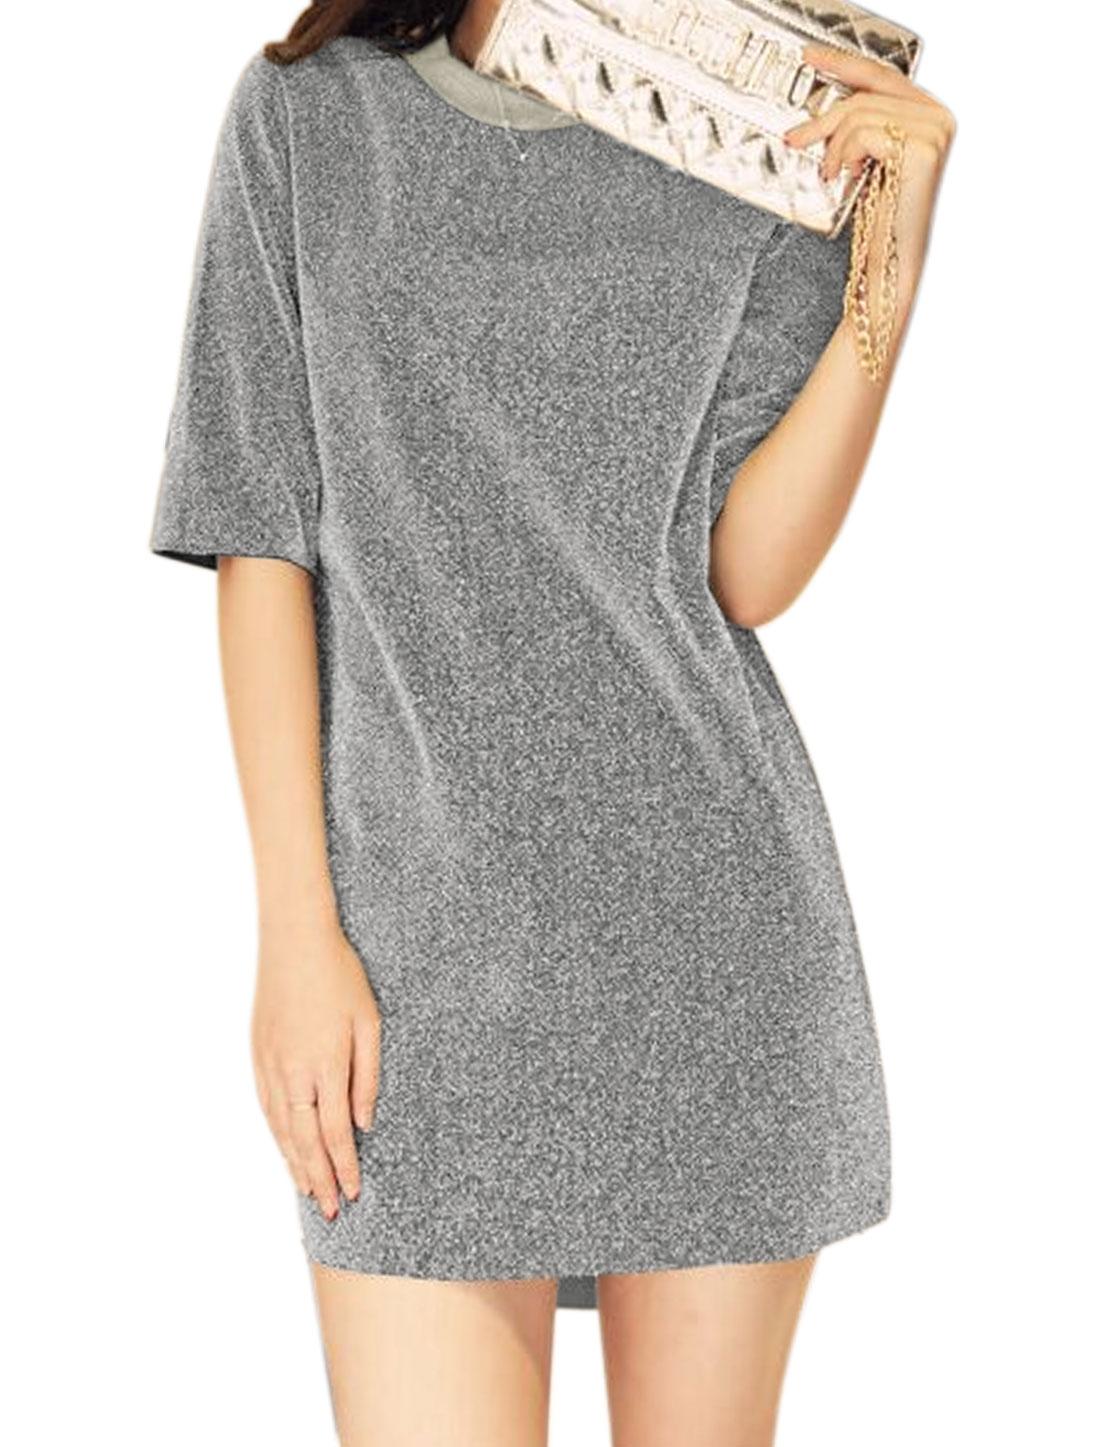 Women Crew Neck Half Sleeves Mini Metallic Dress Silver XS